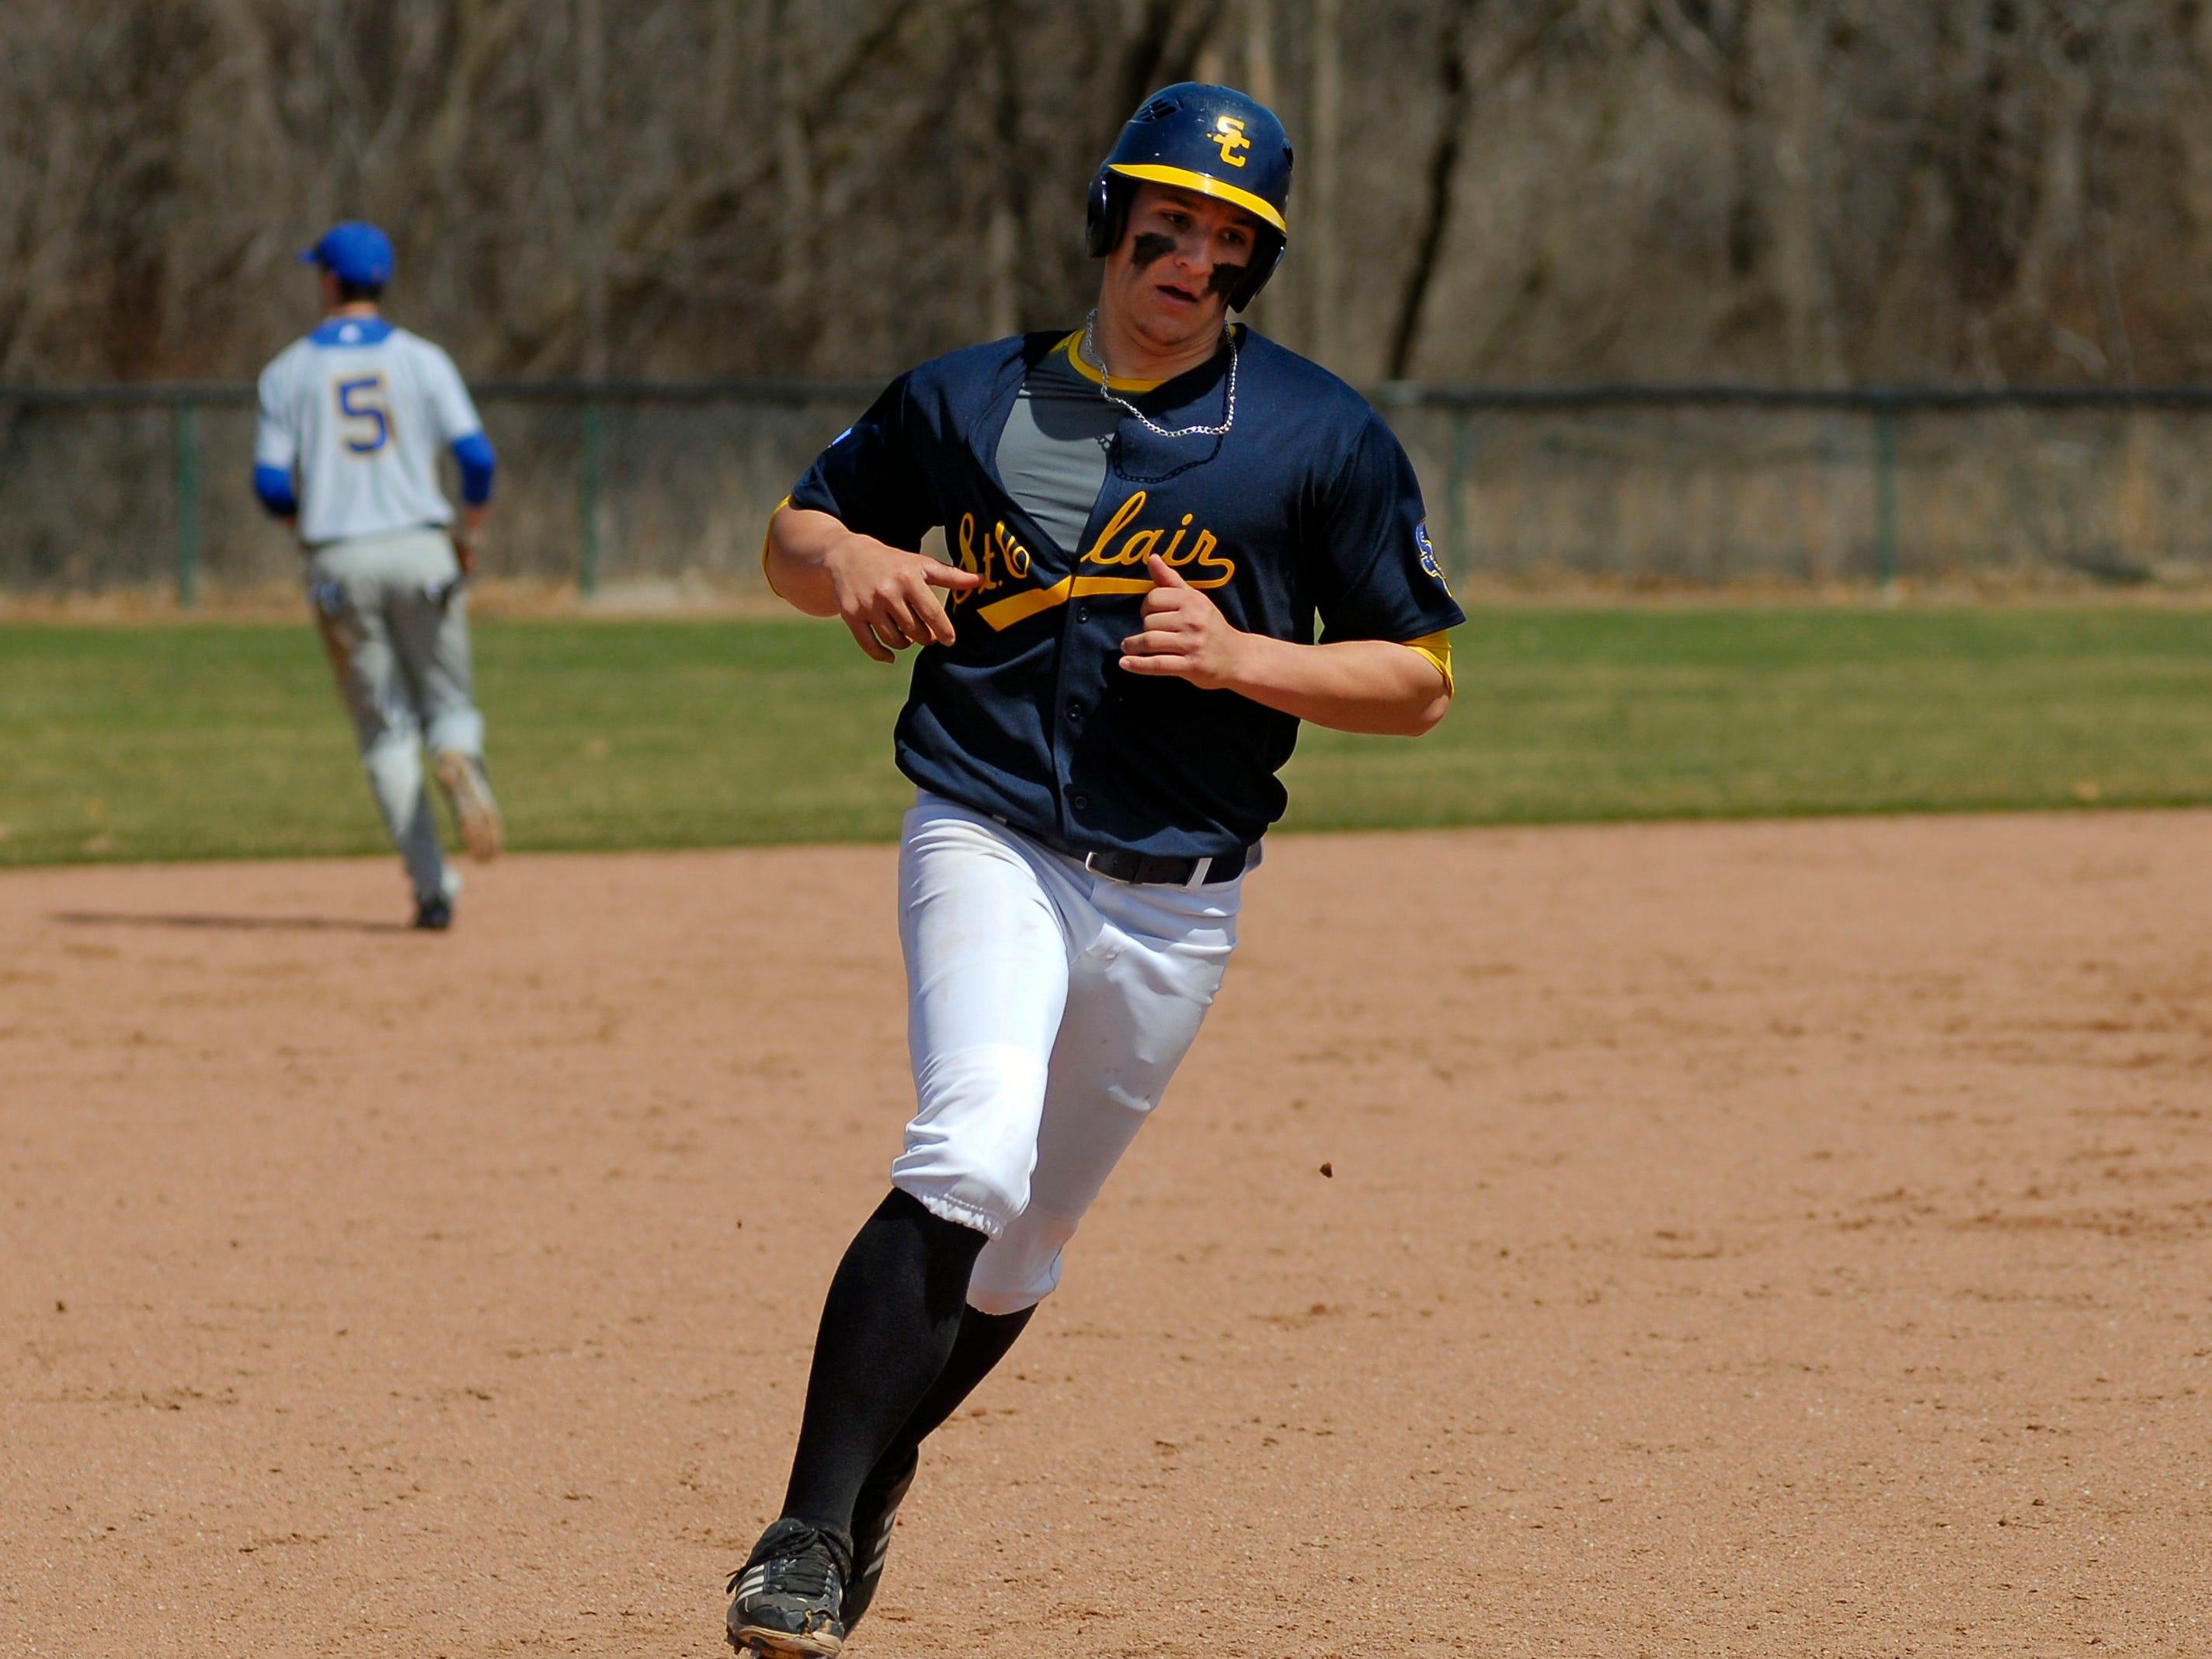 Mitchell Ward runs around third base April 12 during a game against Ancilla College.